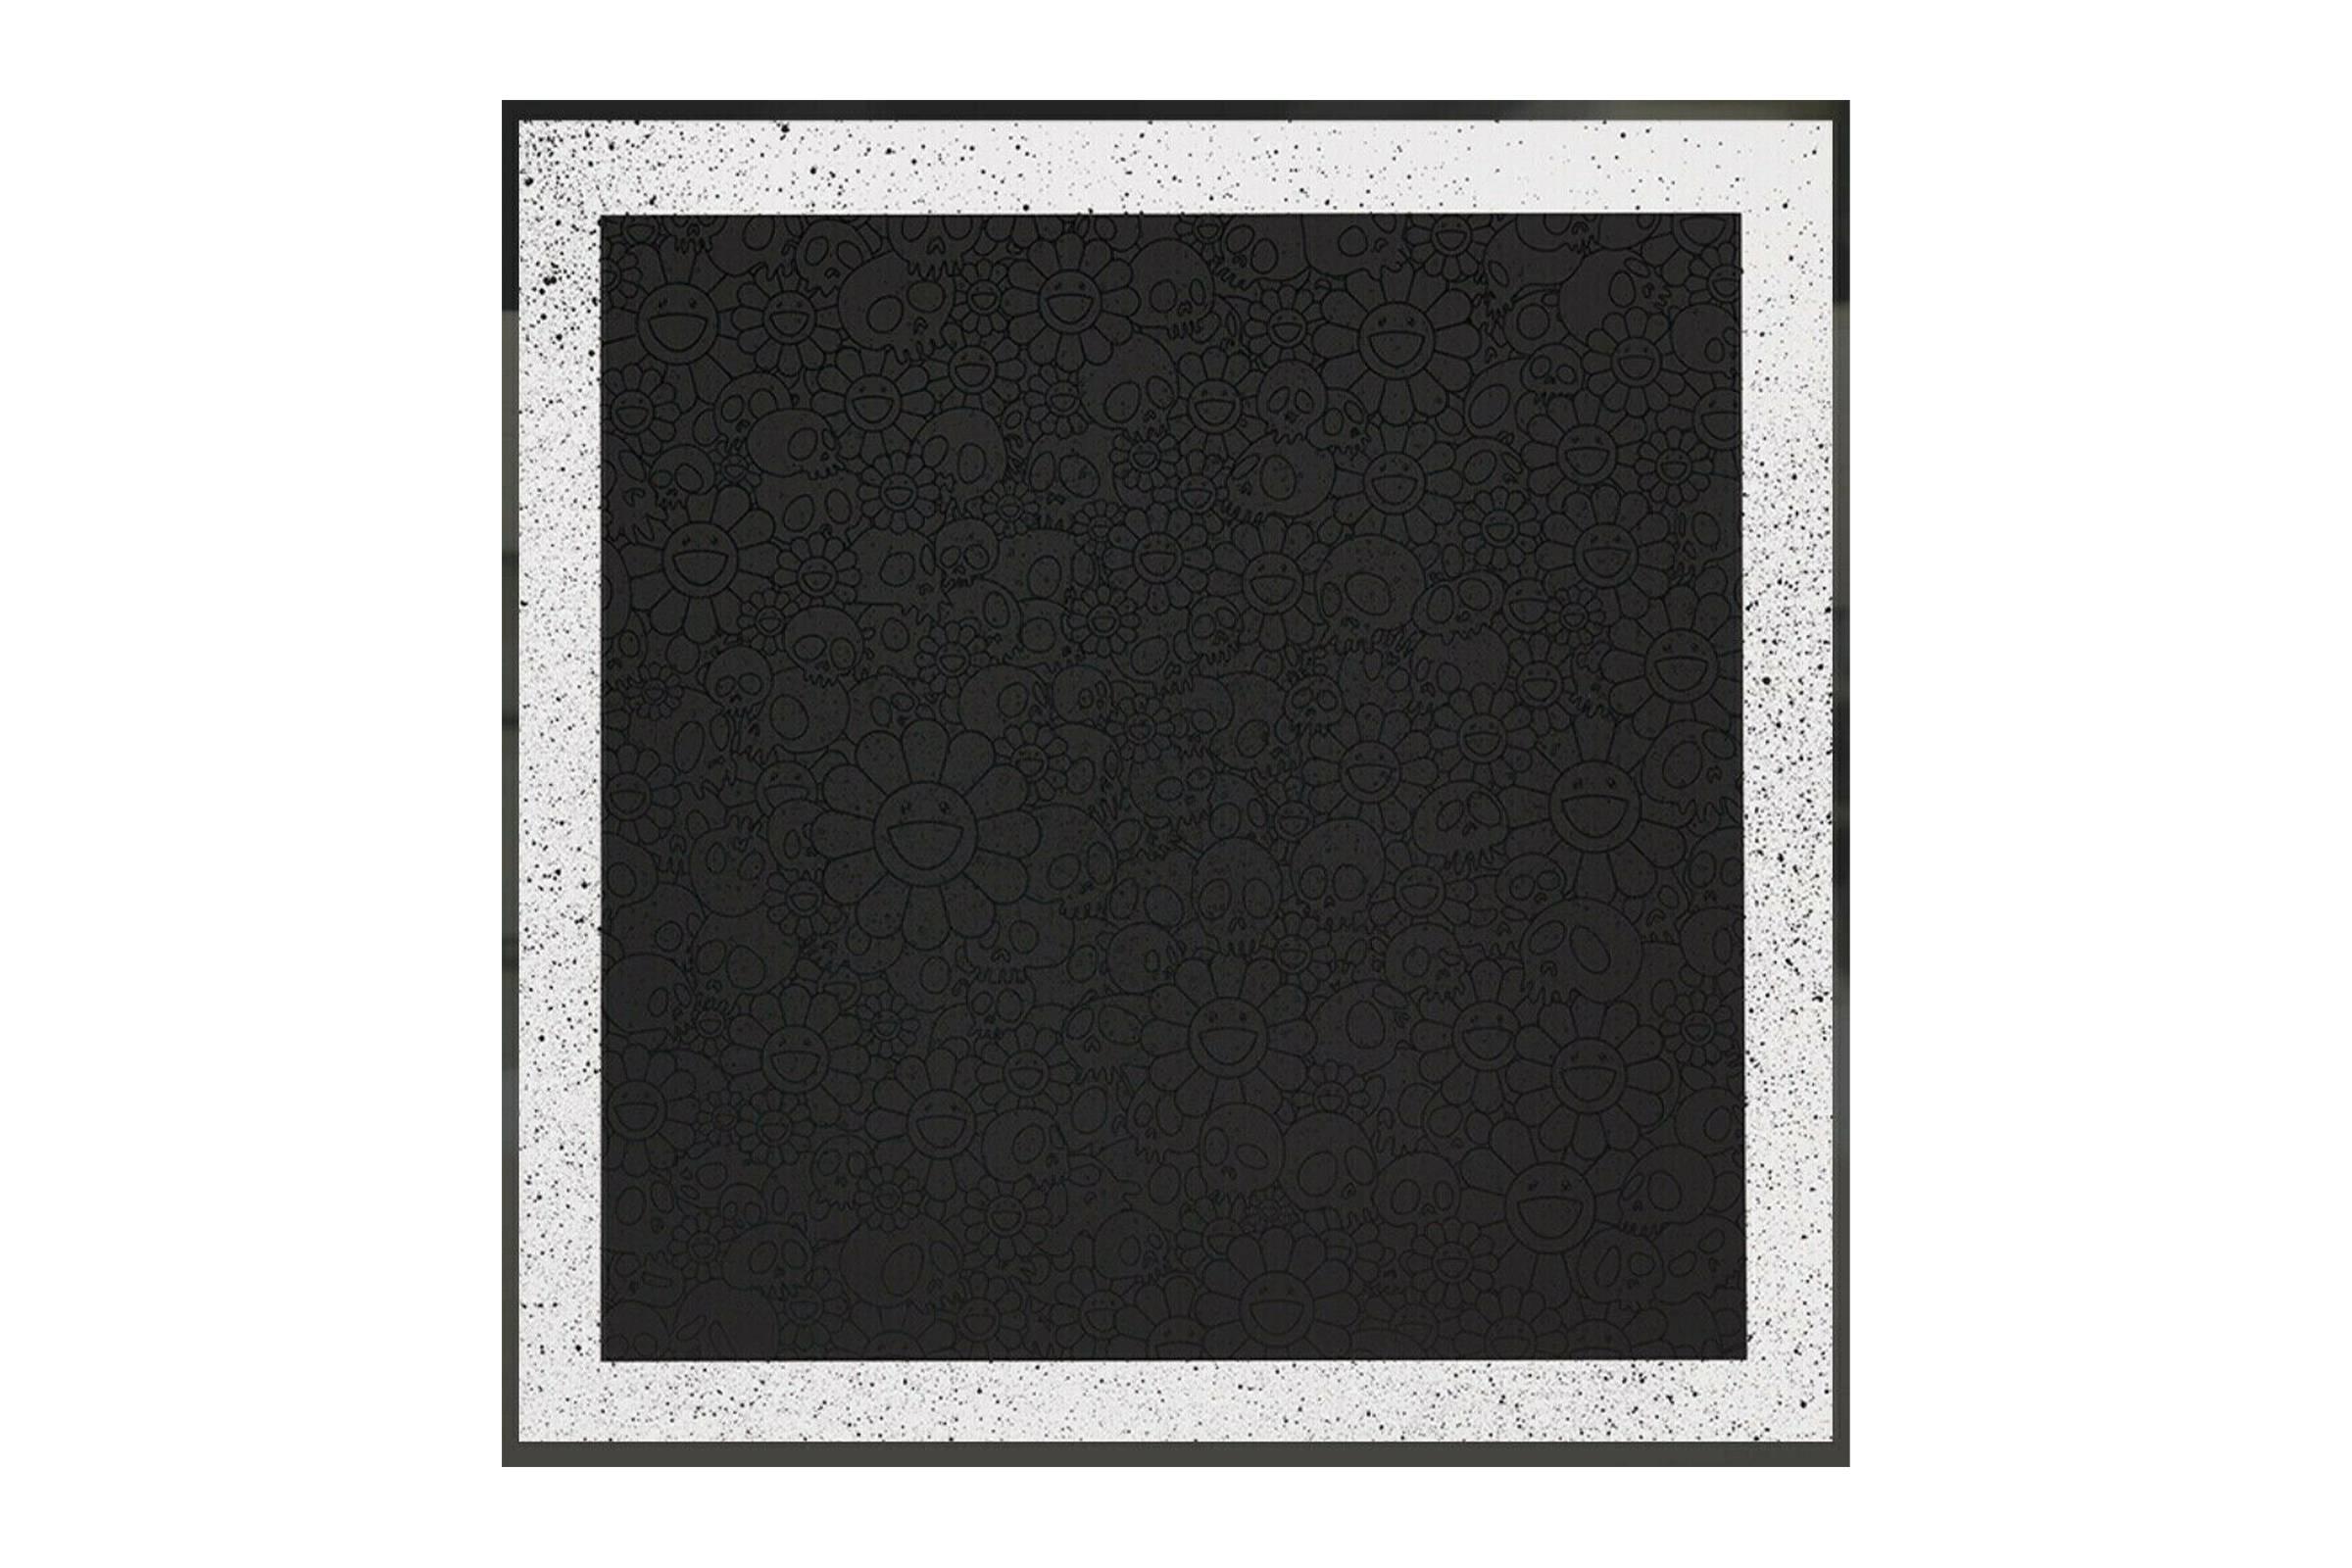 Takashi Murakami for BLM Black Flowers and Skulls Square Print